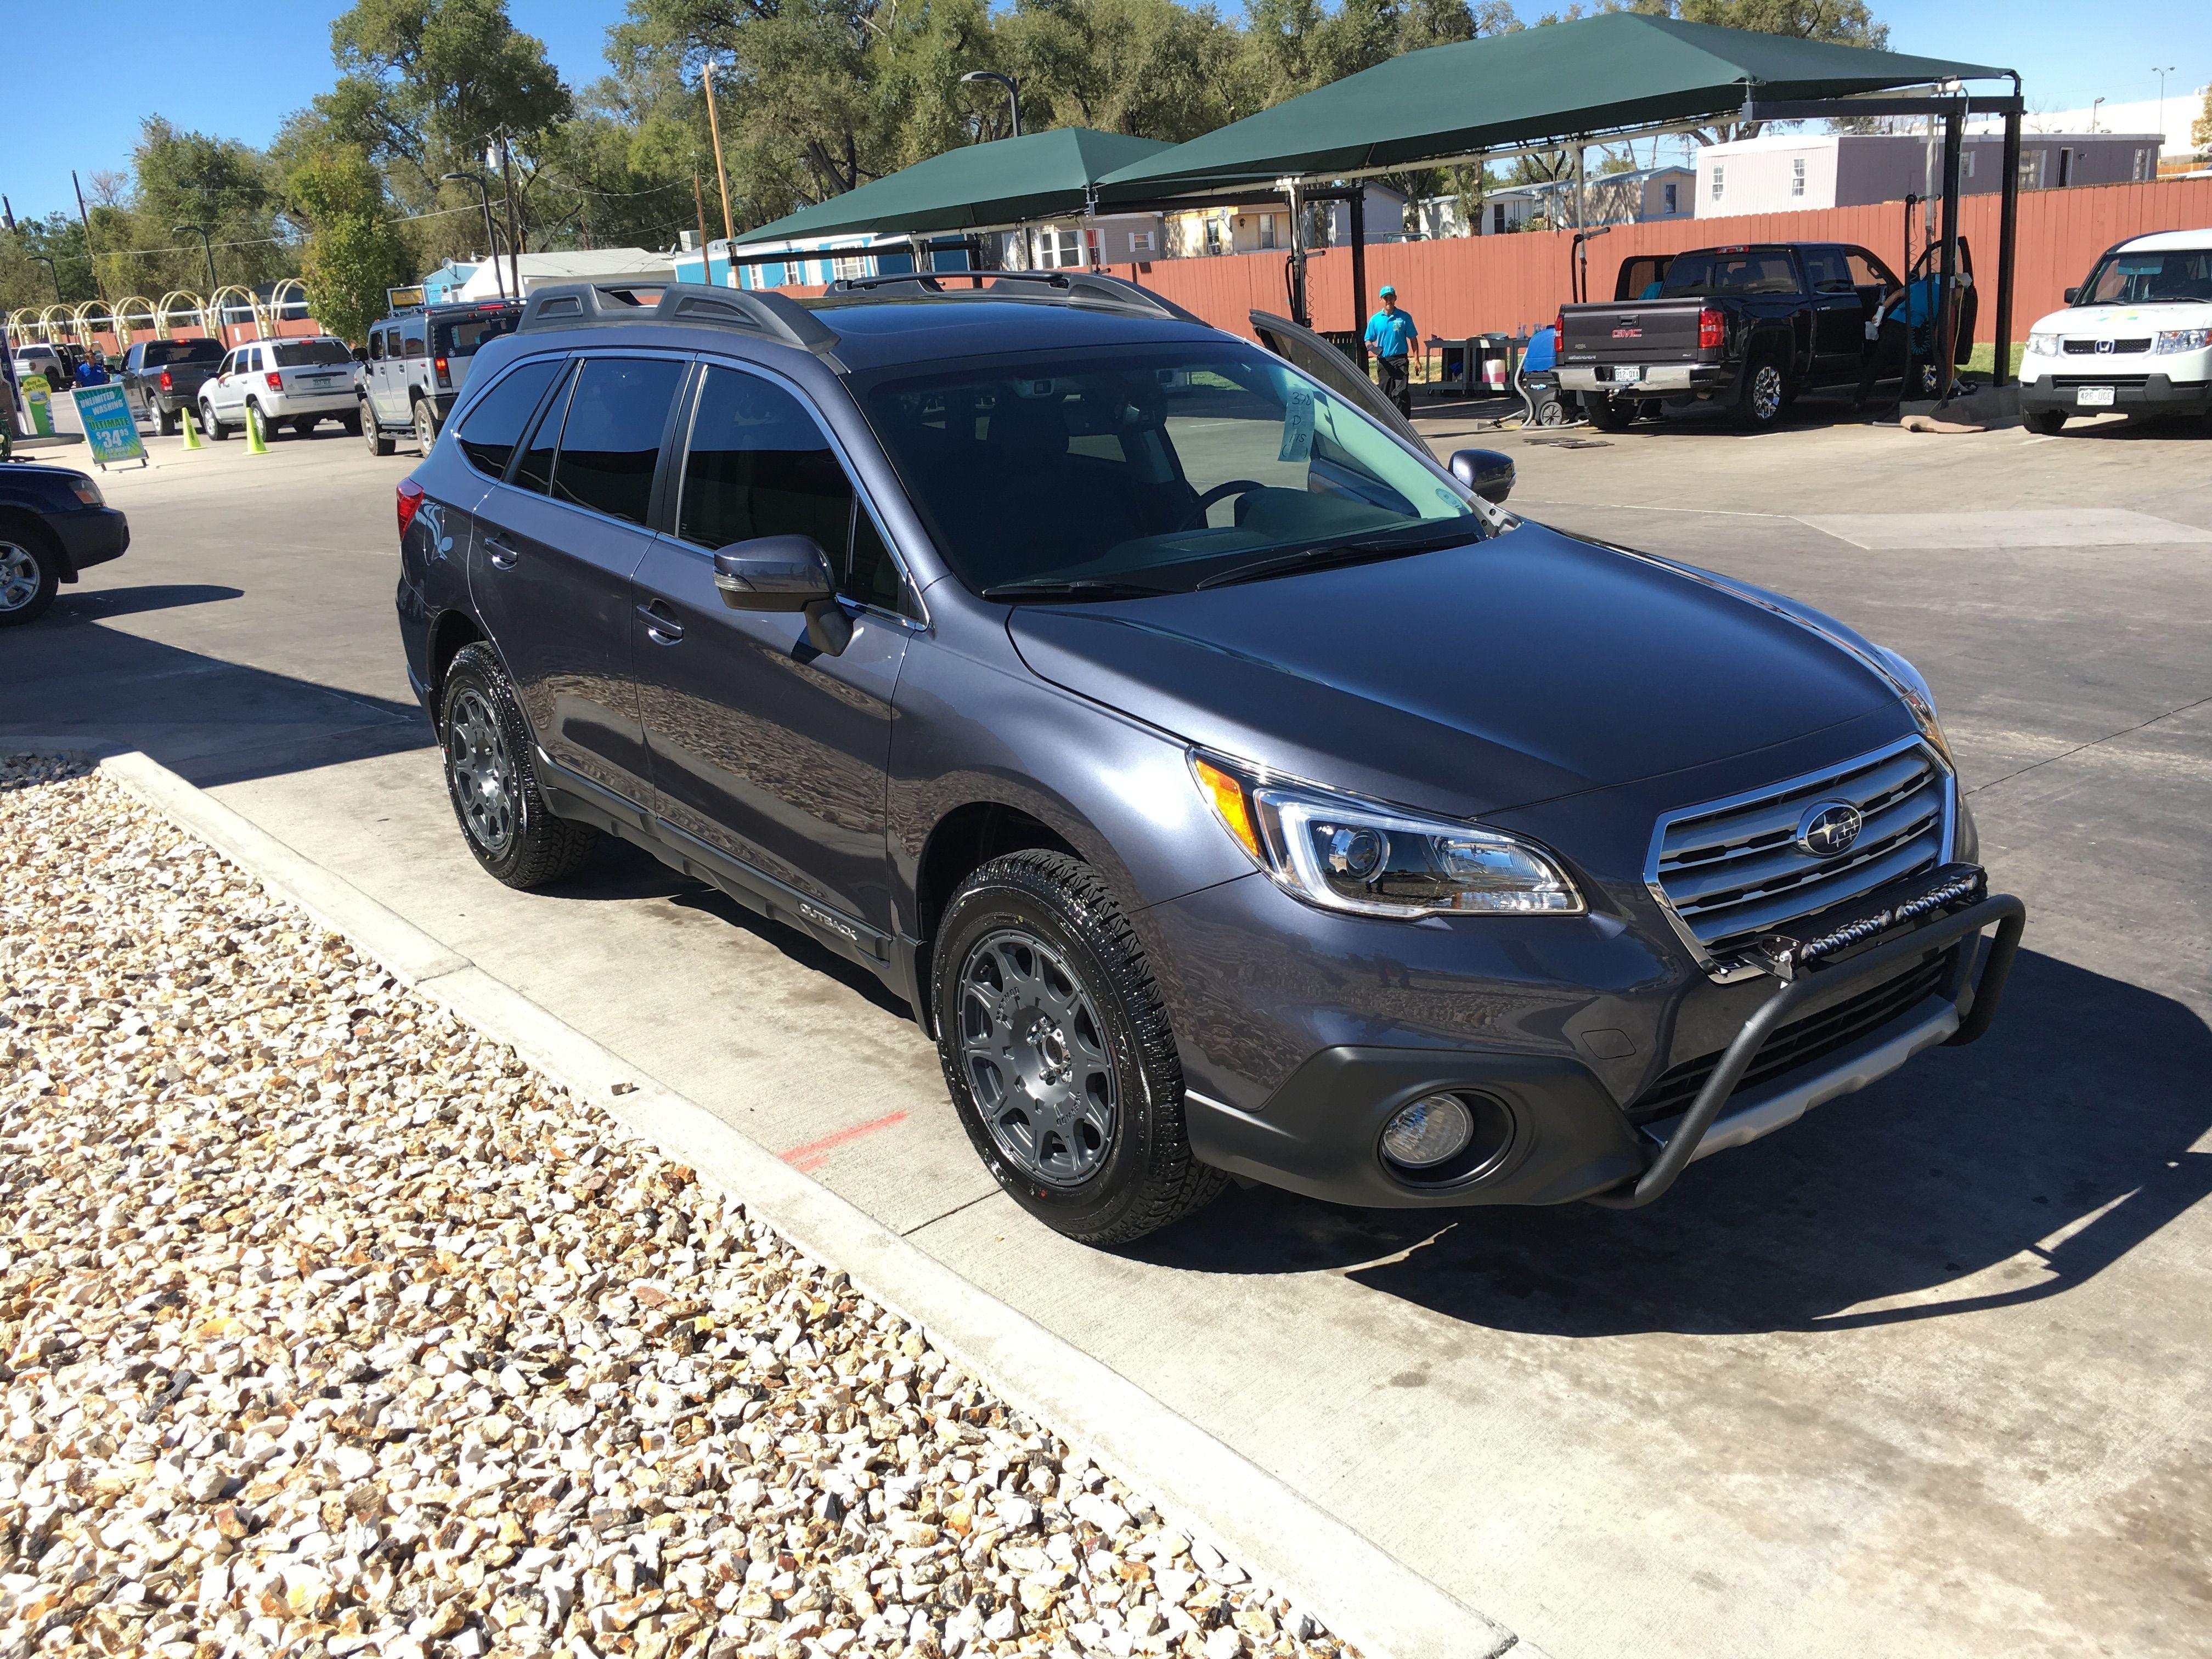 2017 Subaru Outback 2 5i Limited with Method Race Wheels